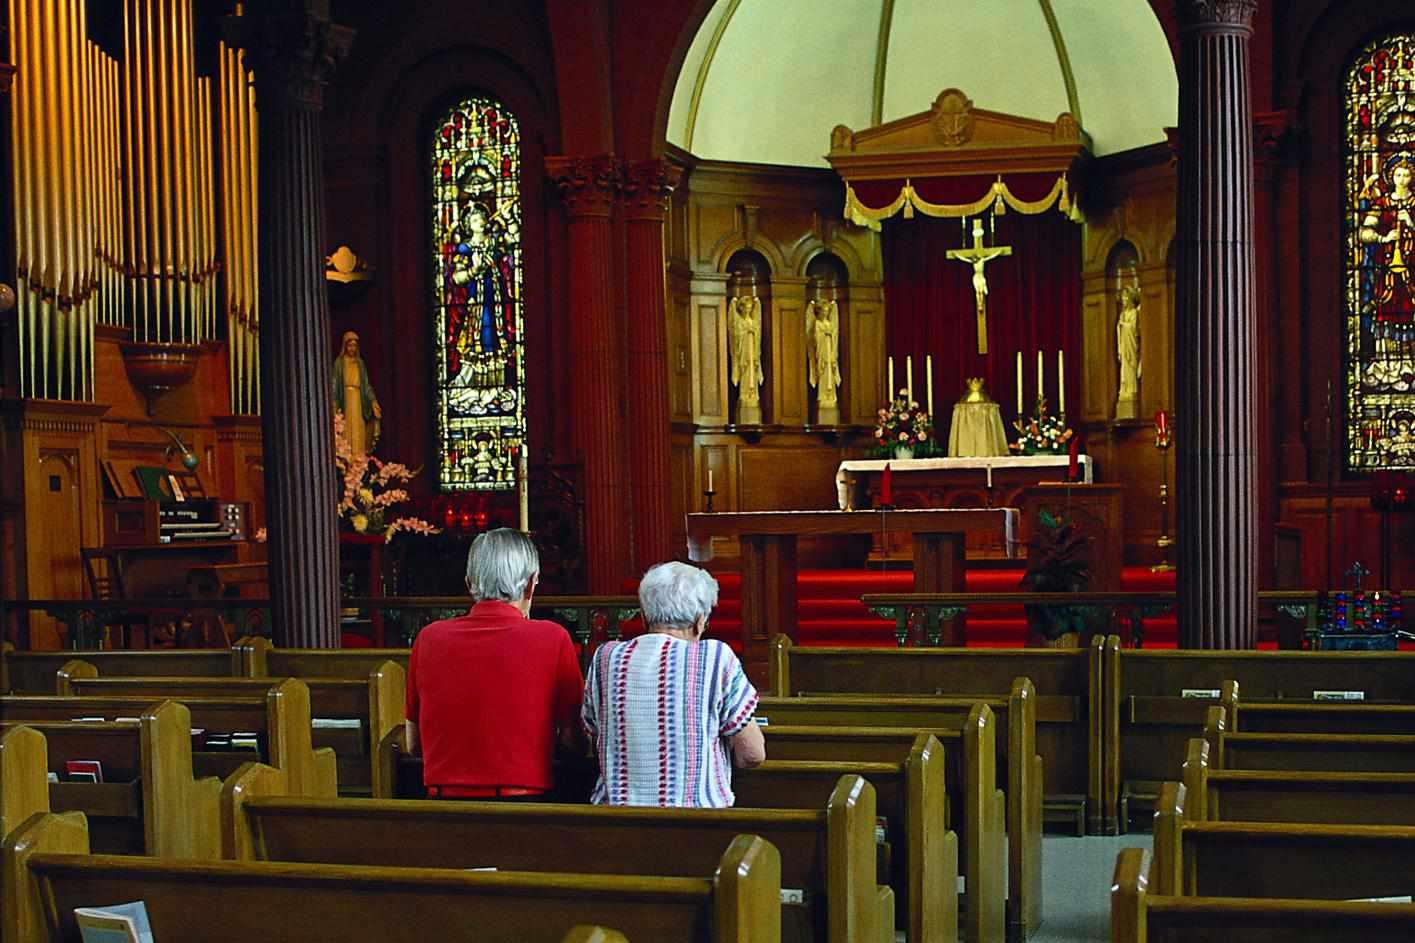 Mature couple in church